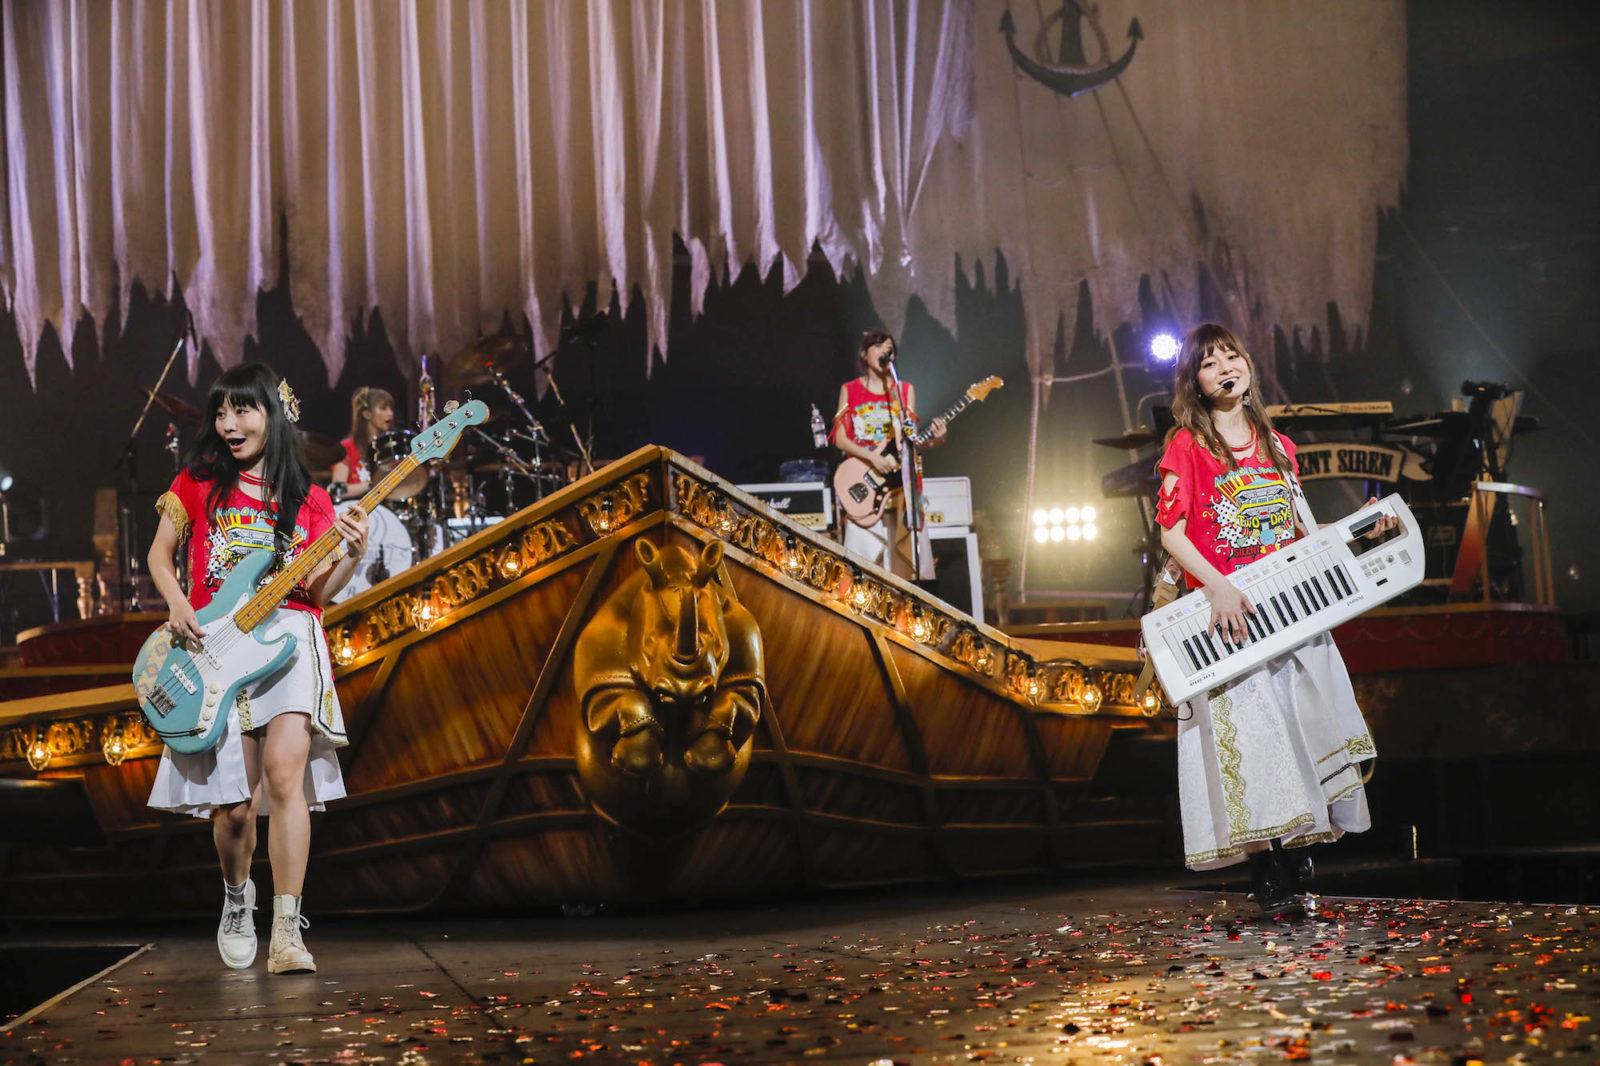 "SILENT SIREN メジャーデビュー5周年の記念すべき日に日本武道館公演 ""奇跡""を起こした夜サムネイル画像"